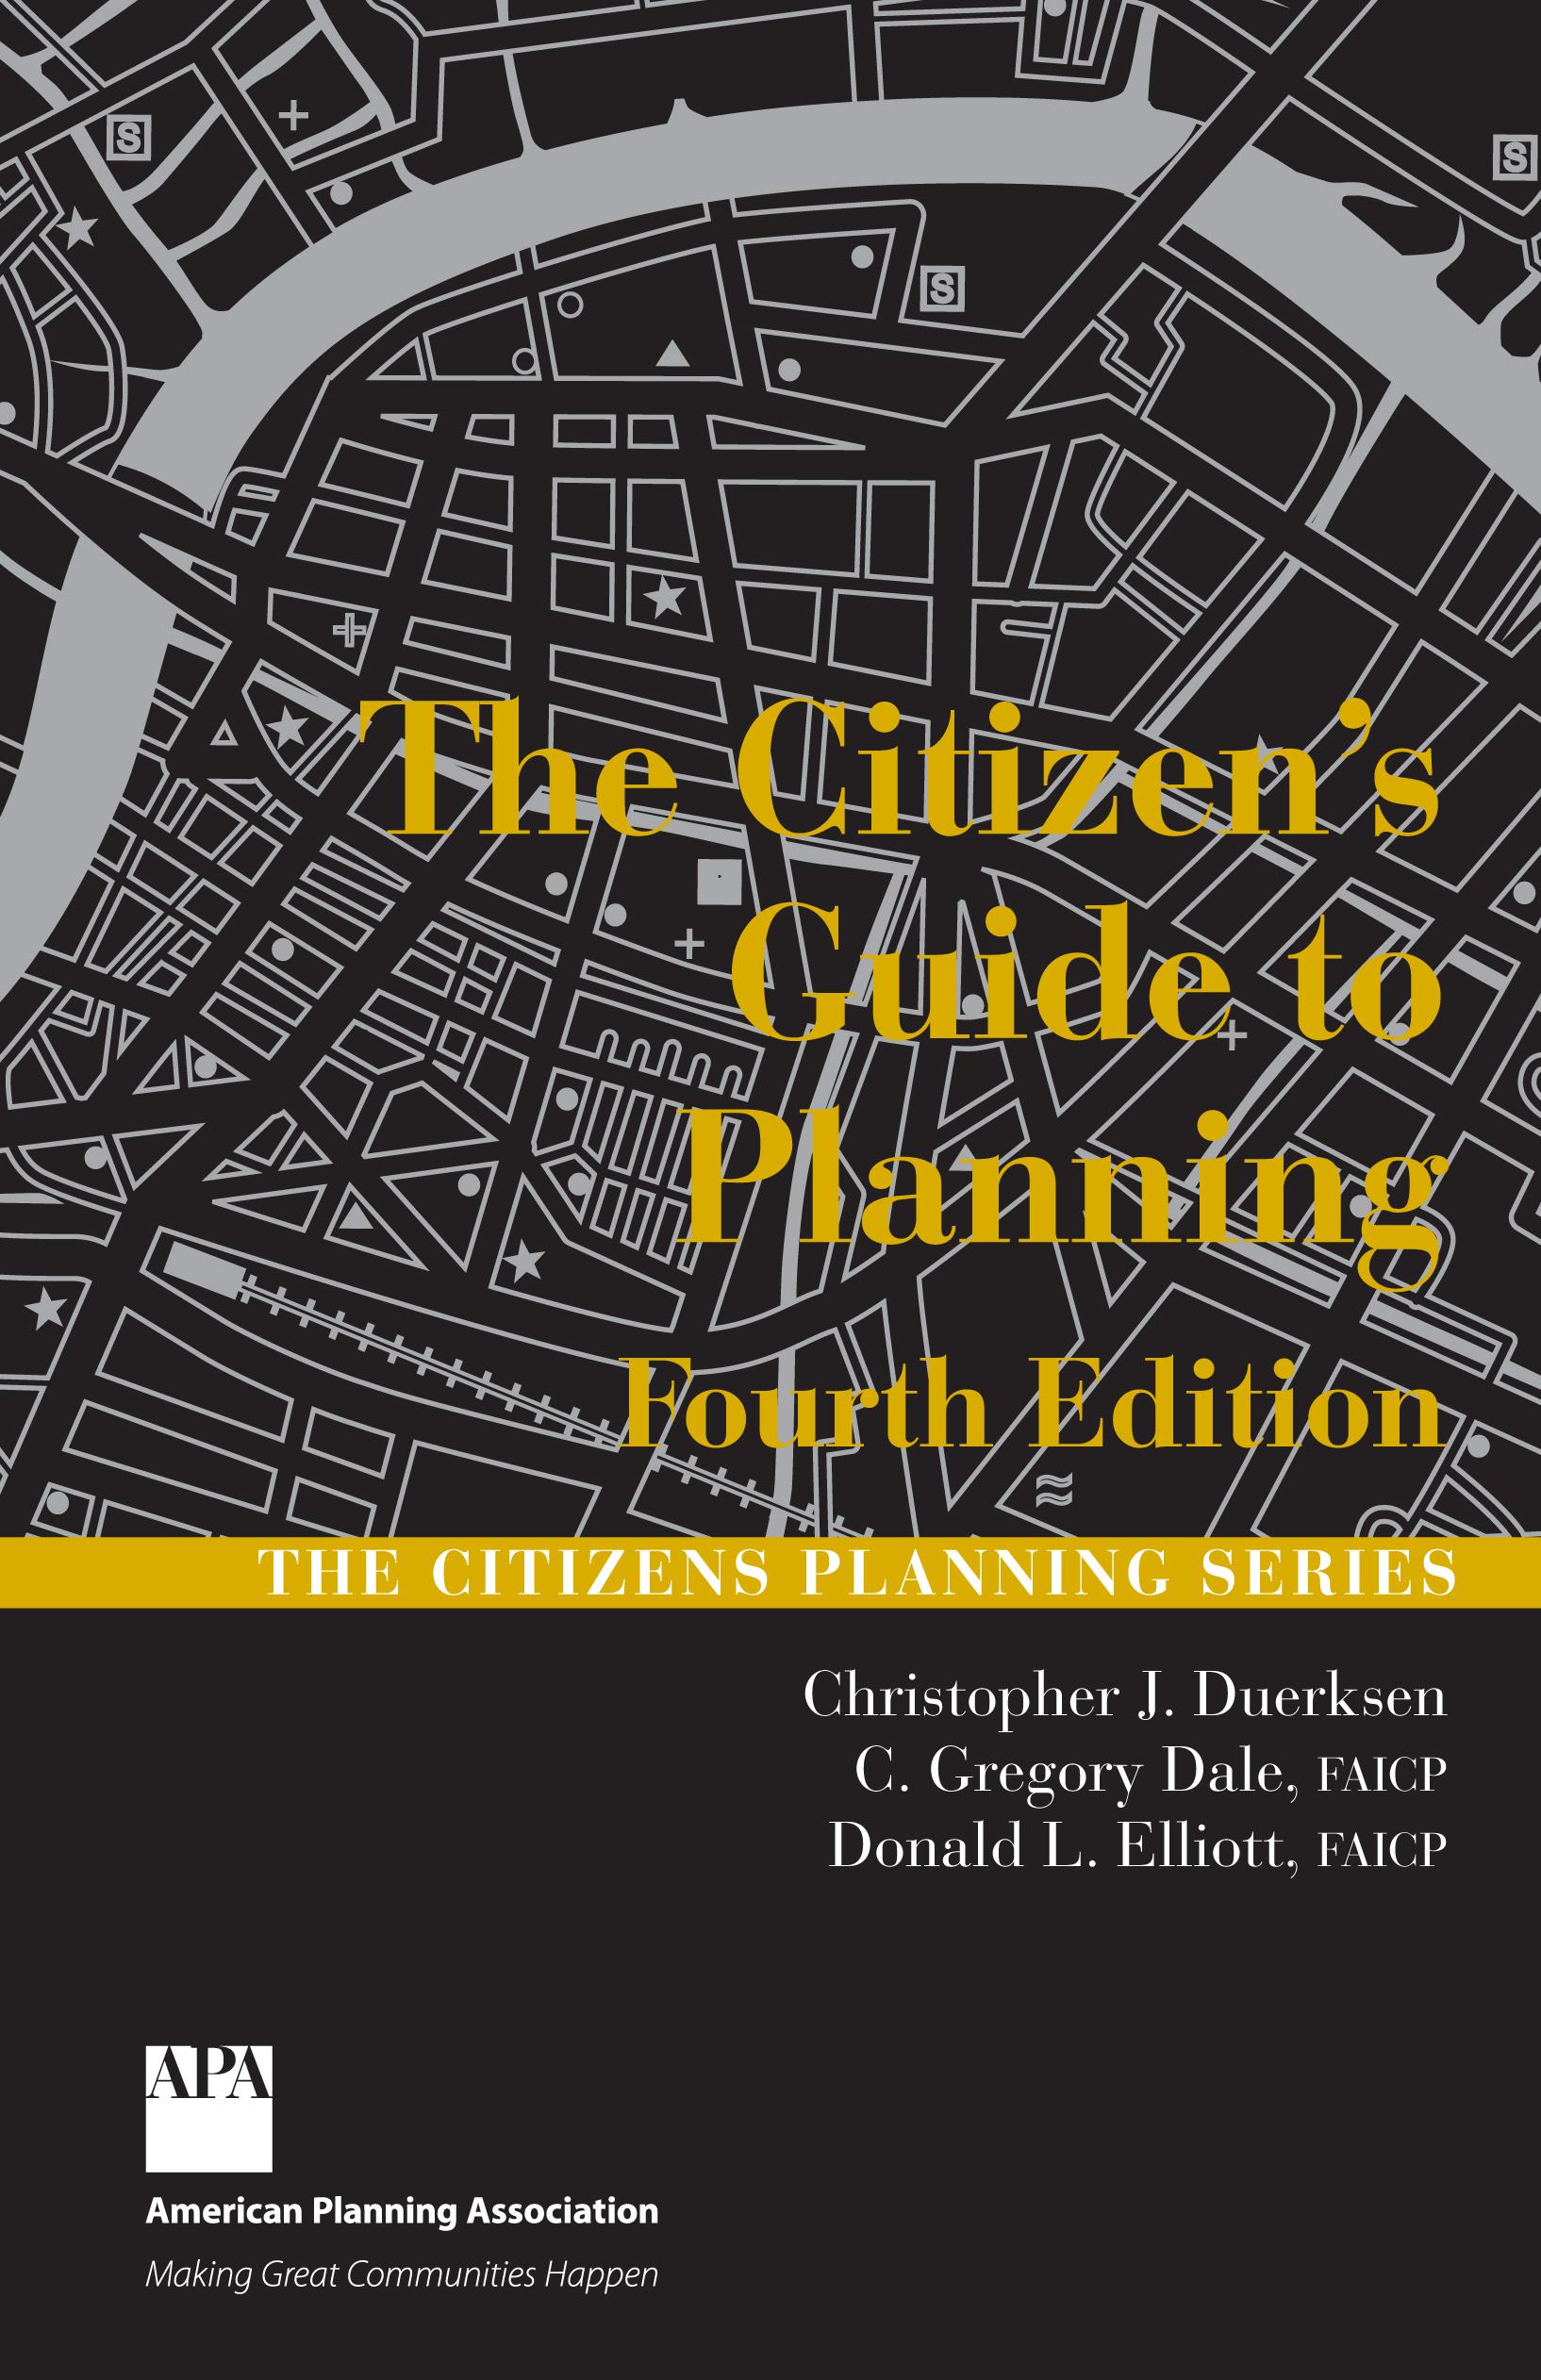 citizen relationship and urban management llc